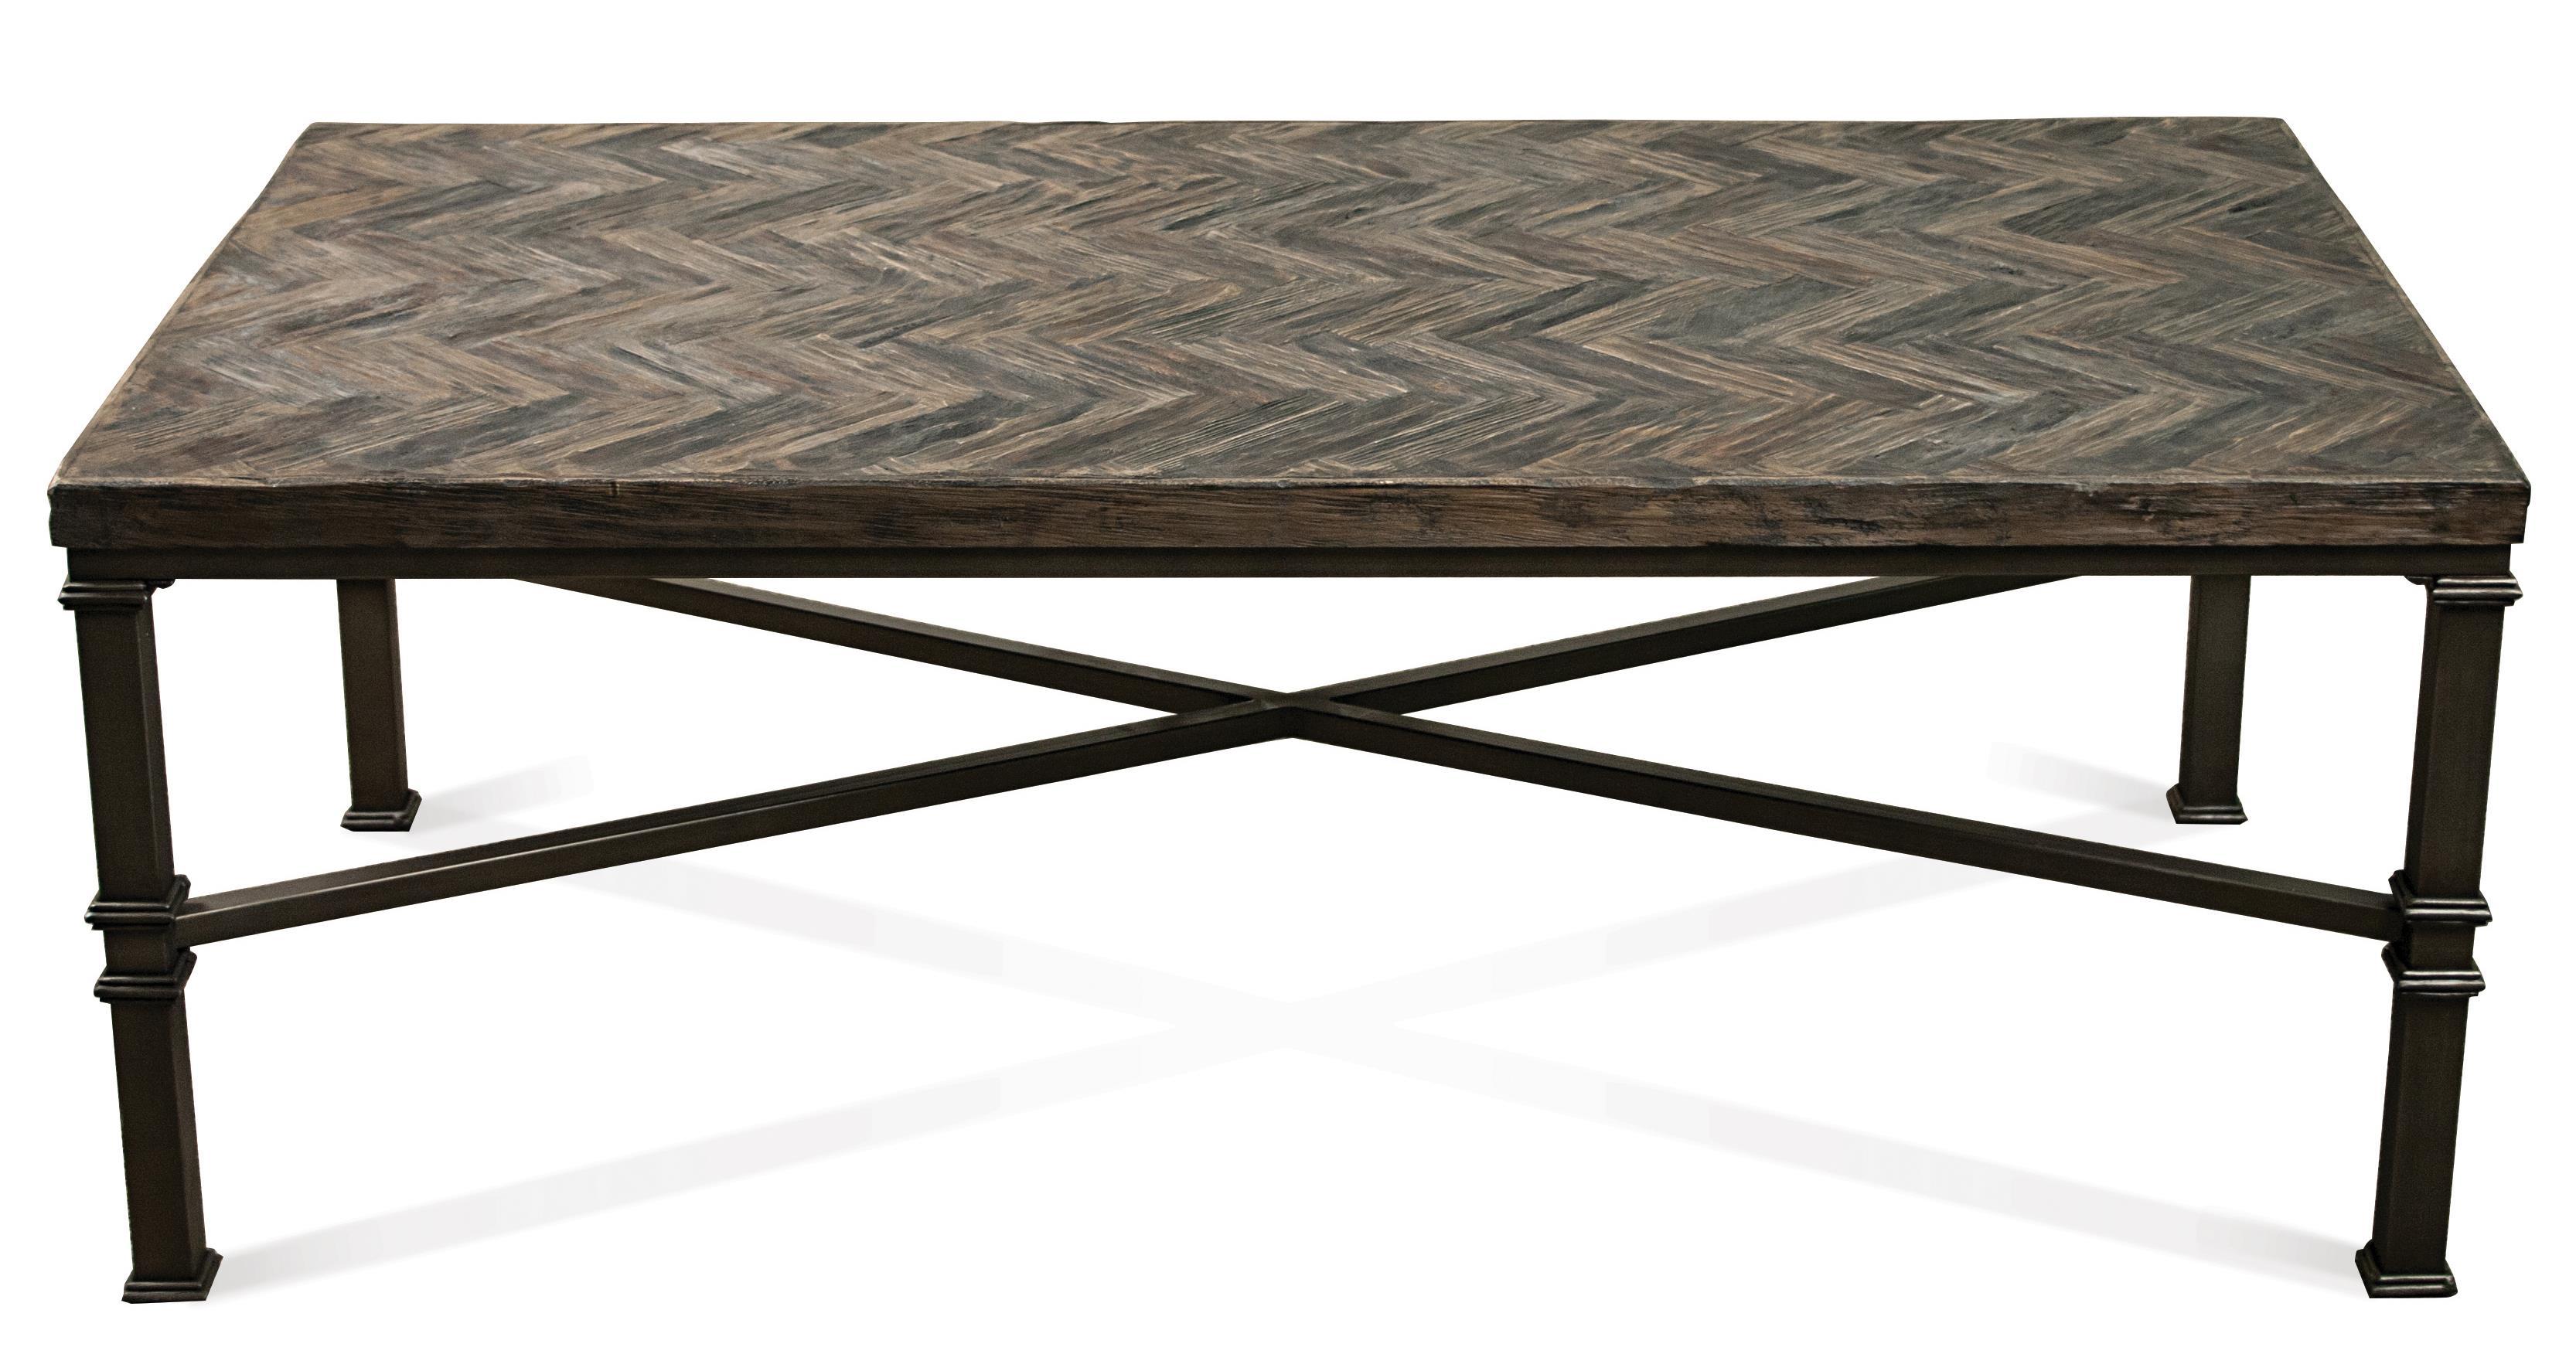 Riverside Furniture Bridlewood Coffee Table - Item Number: 22202